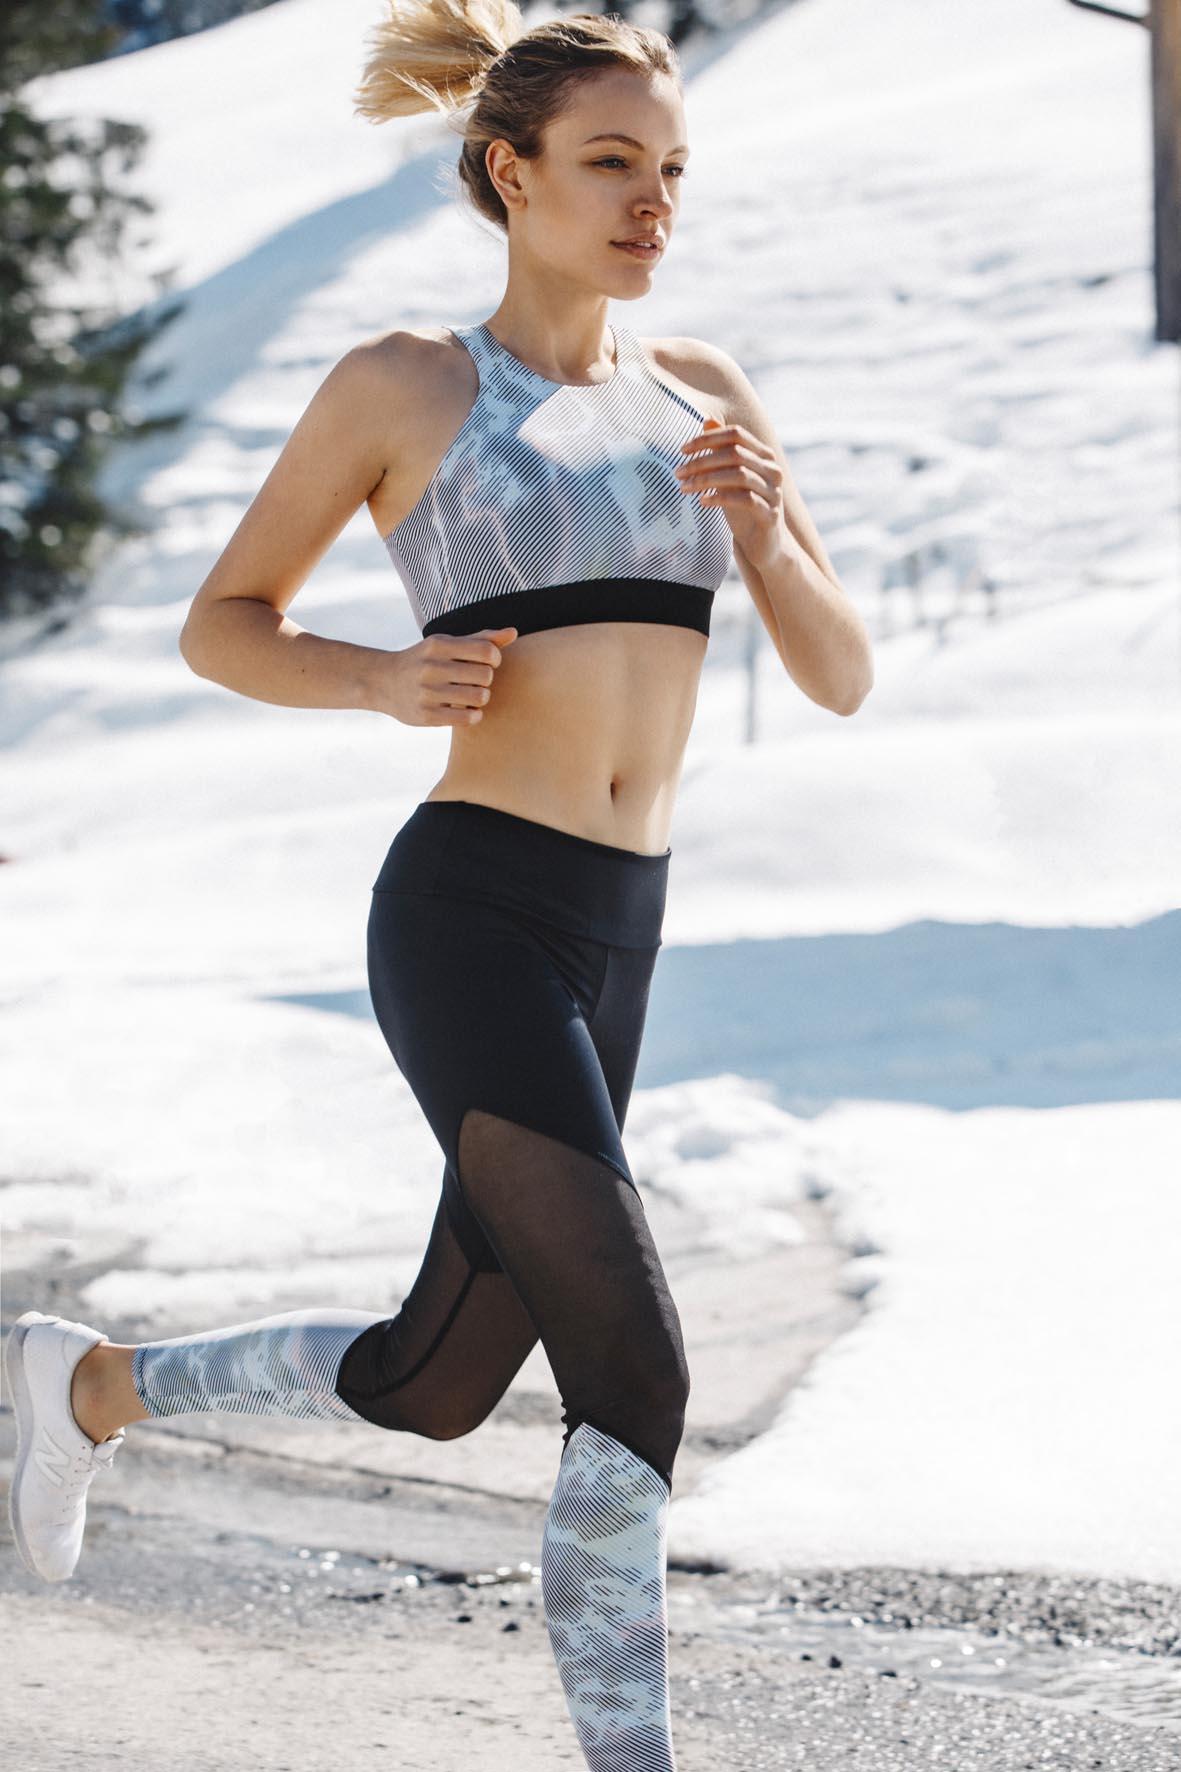 Lena joggt durch den Schnee